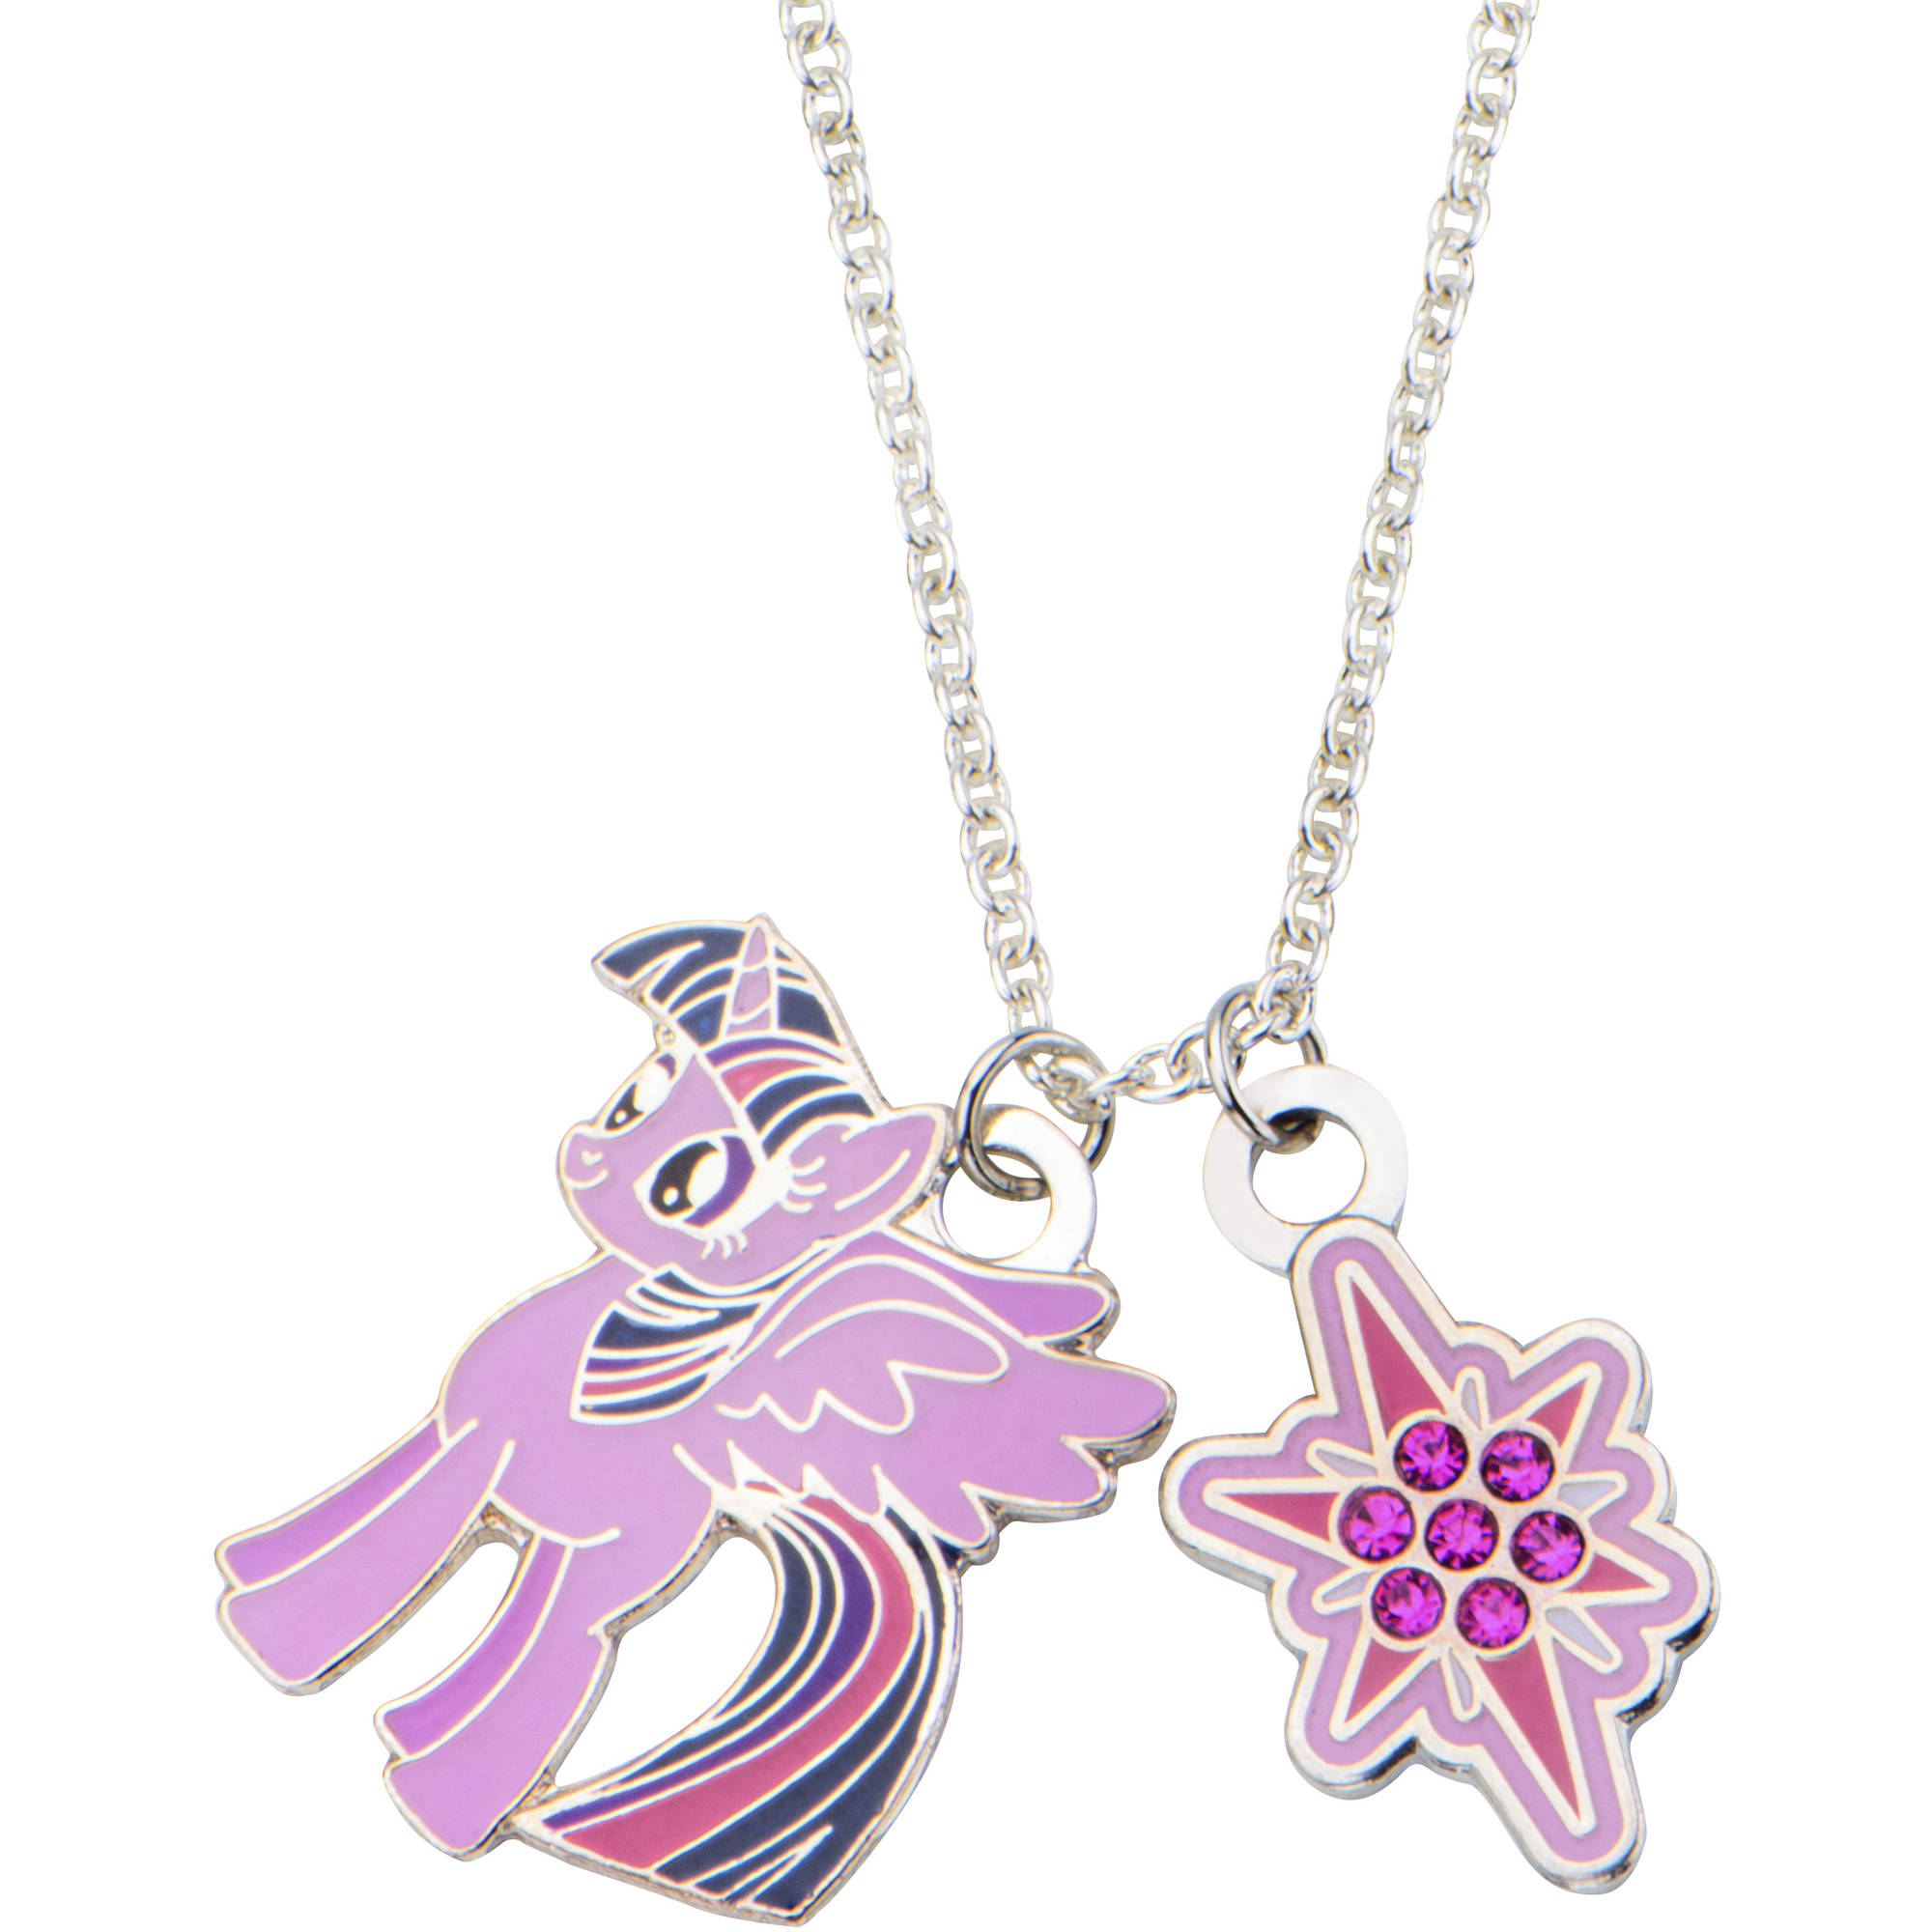 "My Little Pony Kids' Fine Silver-Tone Twilight Sparkle Pendant, 16"" Chain"